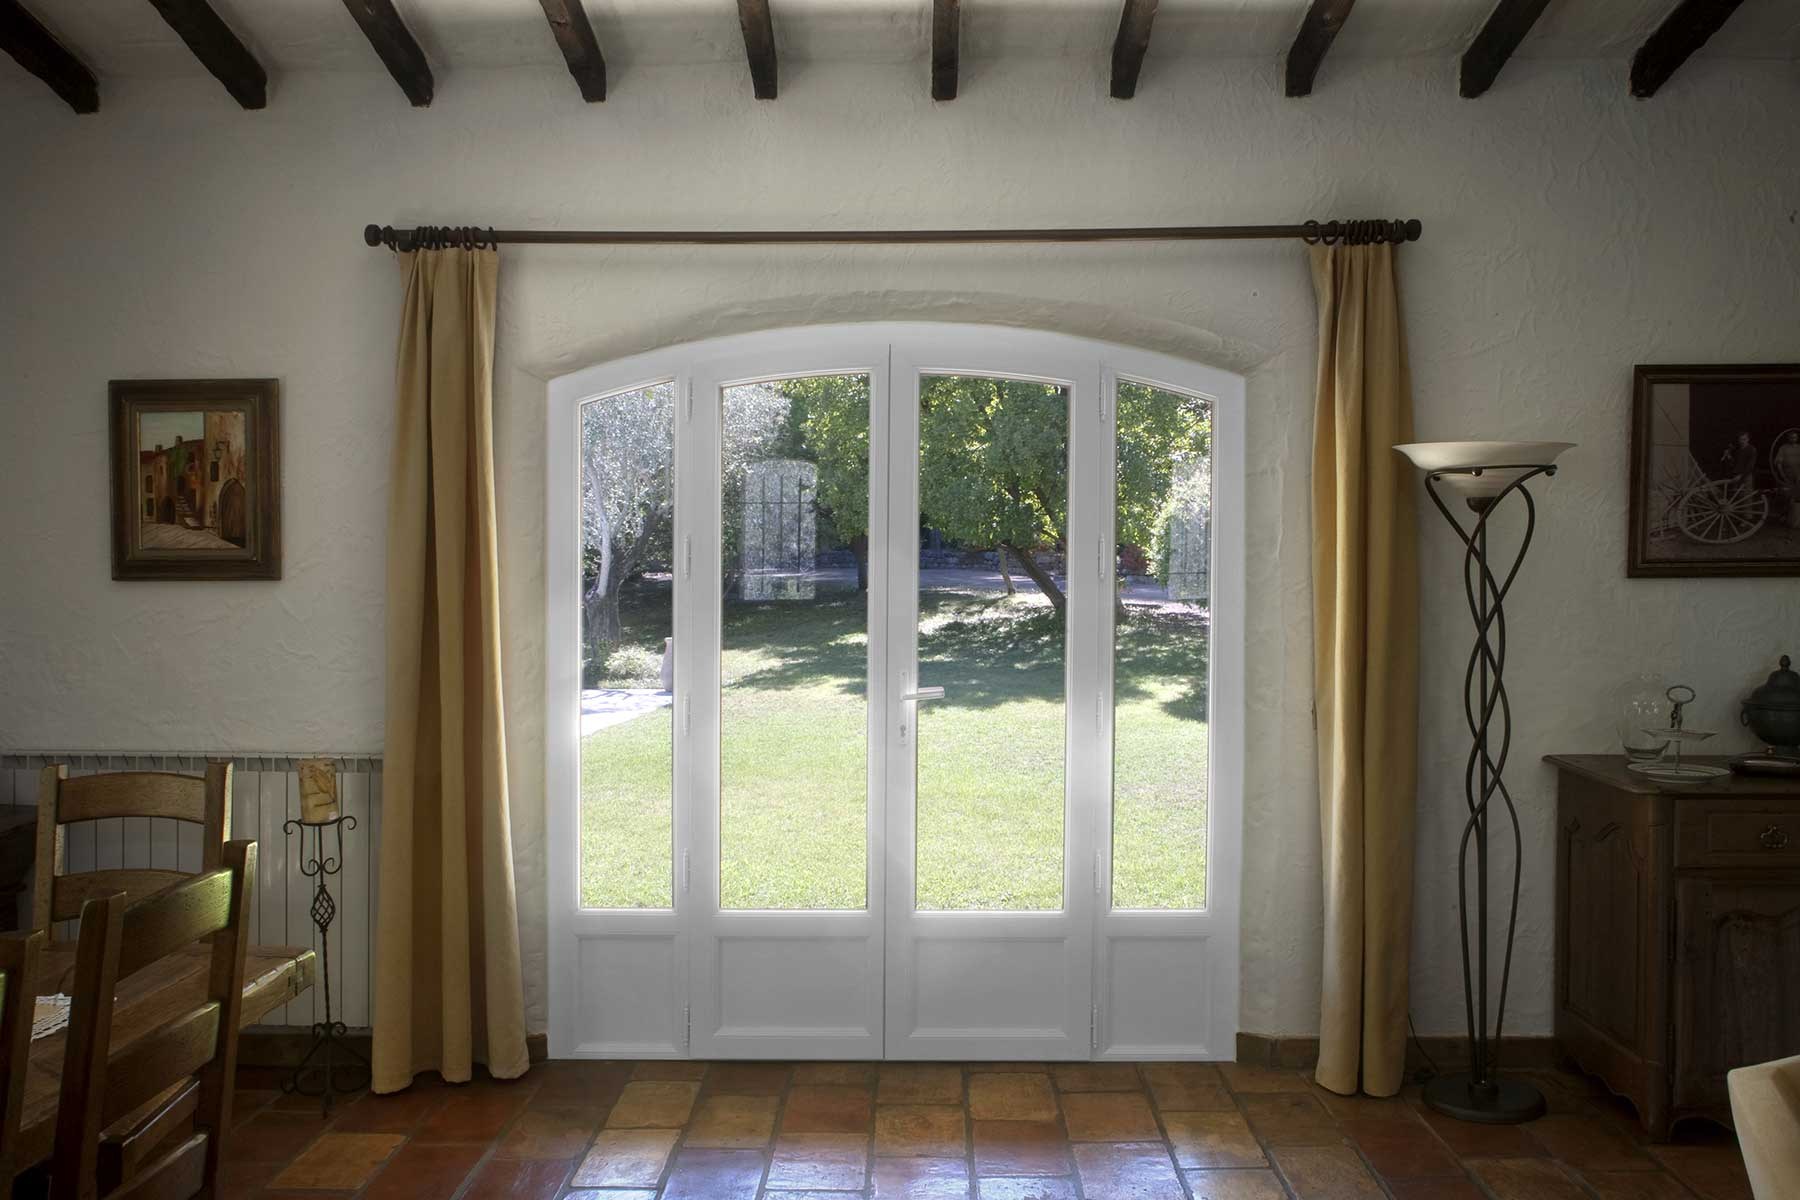 menuiserie pvc cintr e veran 39 baie. Black Bedroom Furniture Sets. Home Design Ideas